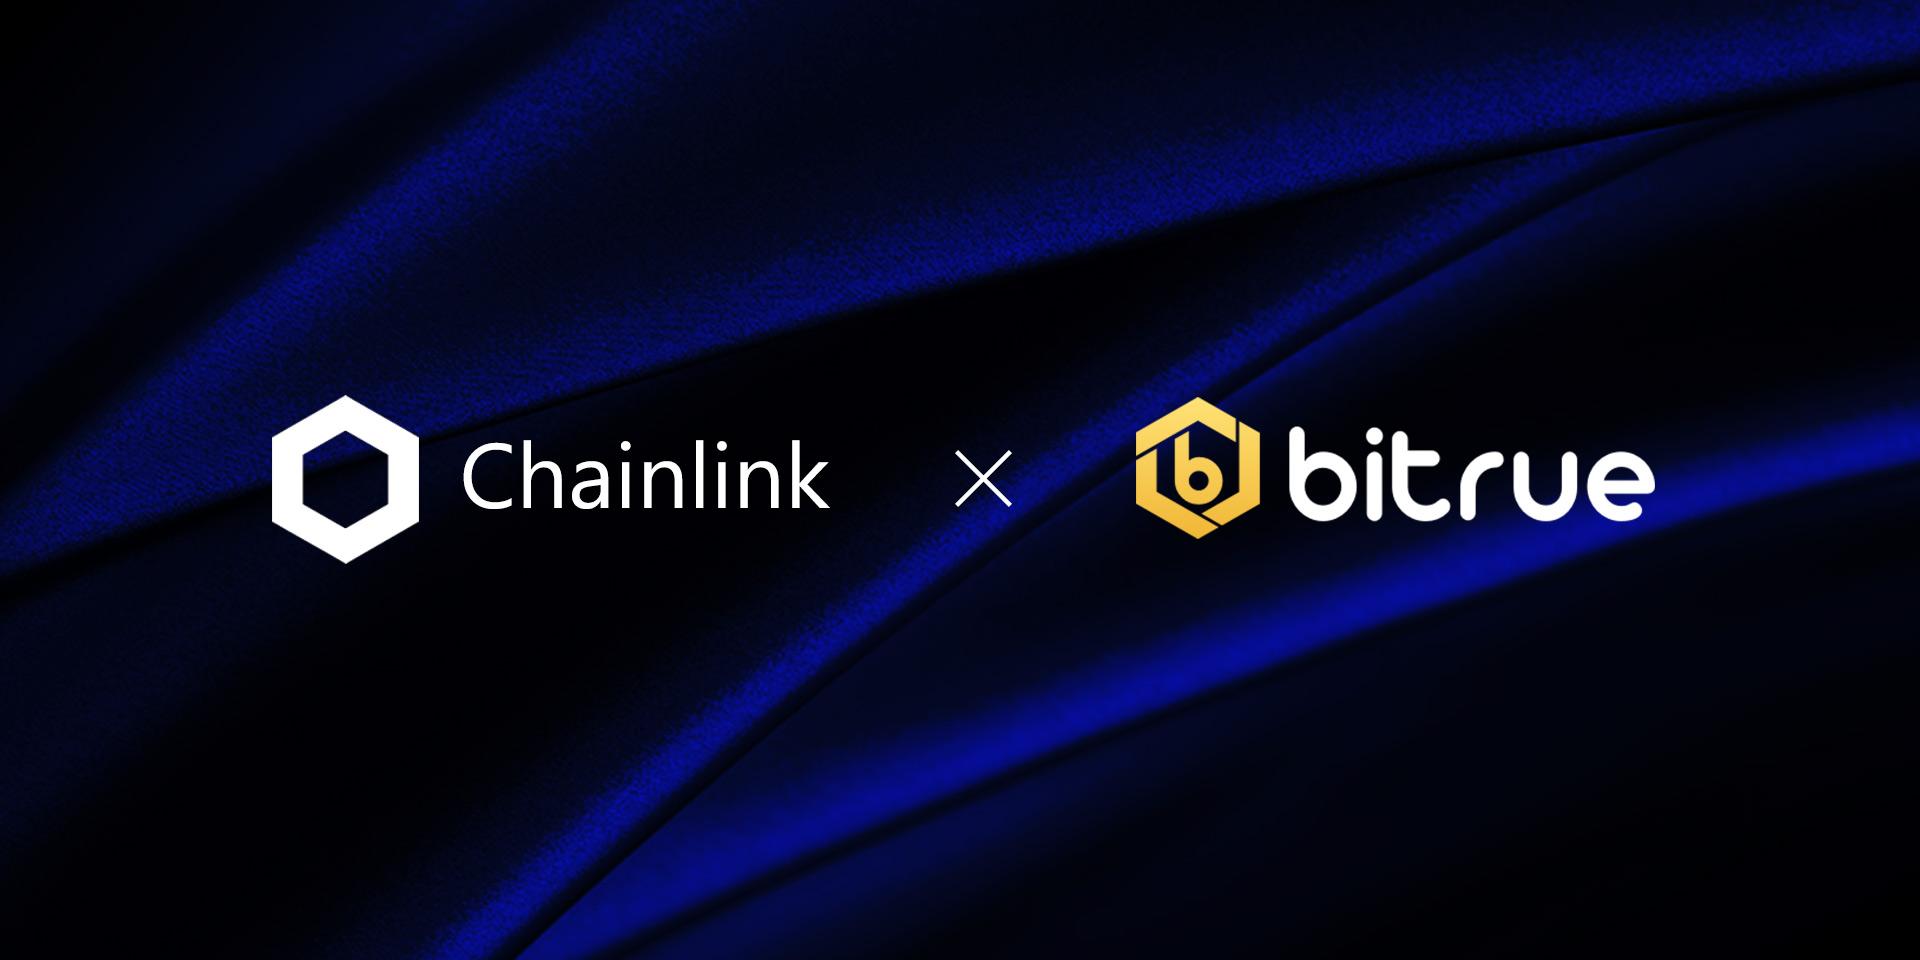 7.30_Chainlink.jpg